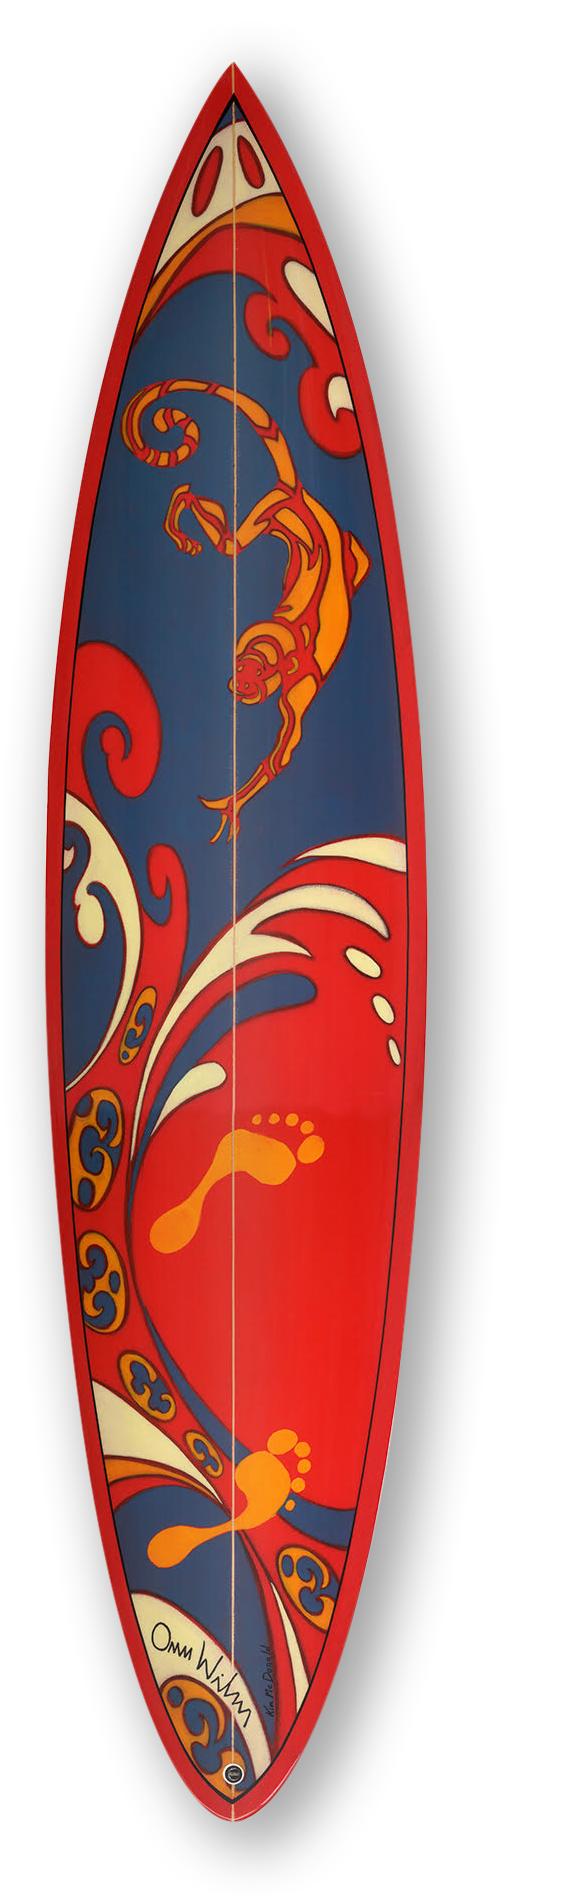 """Monkey Business"" | Size 7'2"" Surfboard | Hand shaped by David Gott"